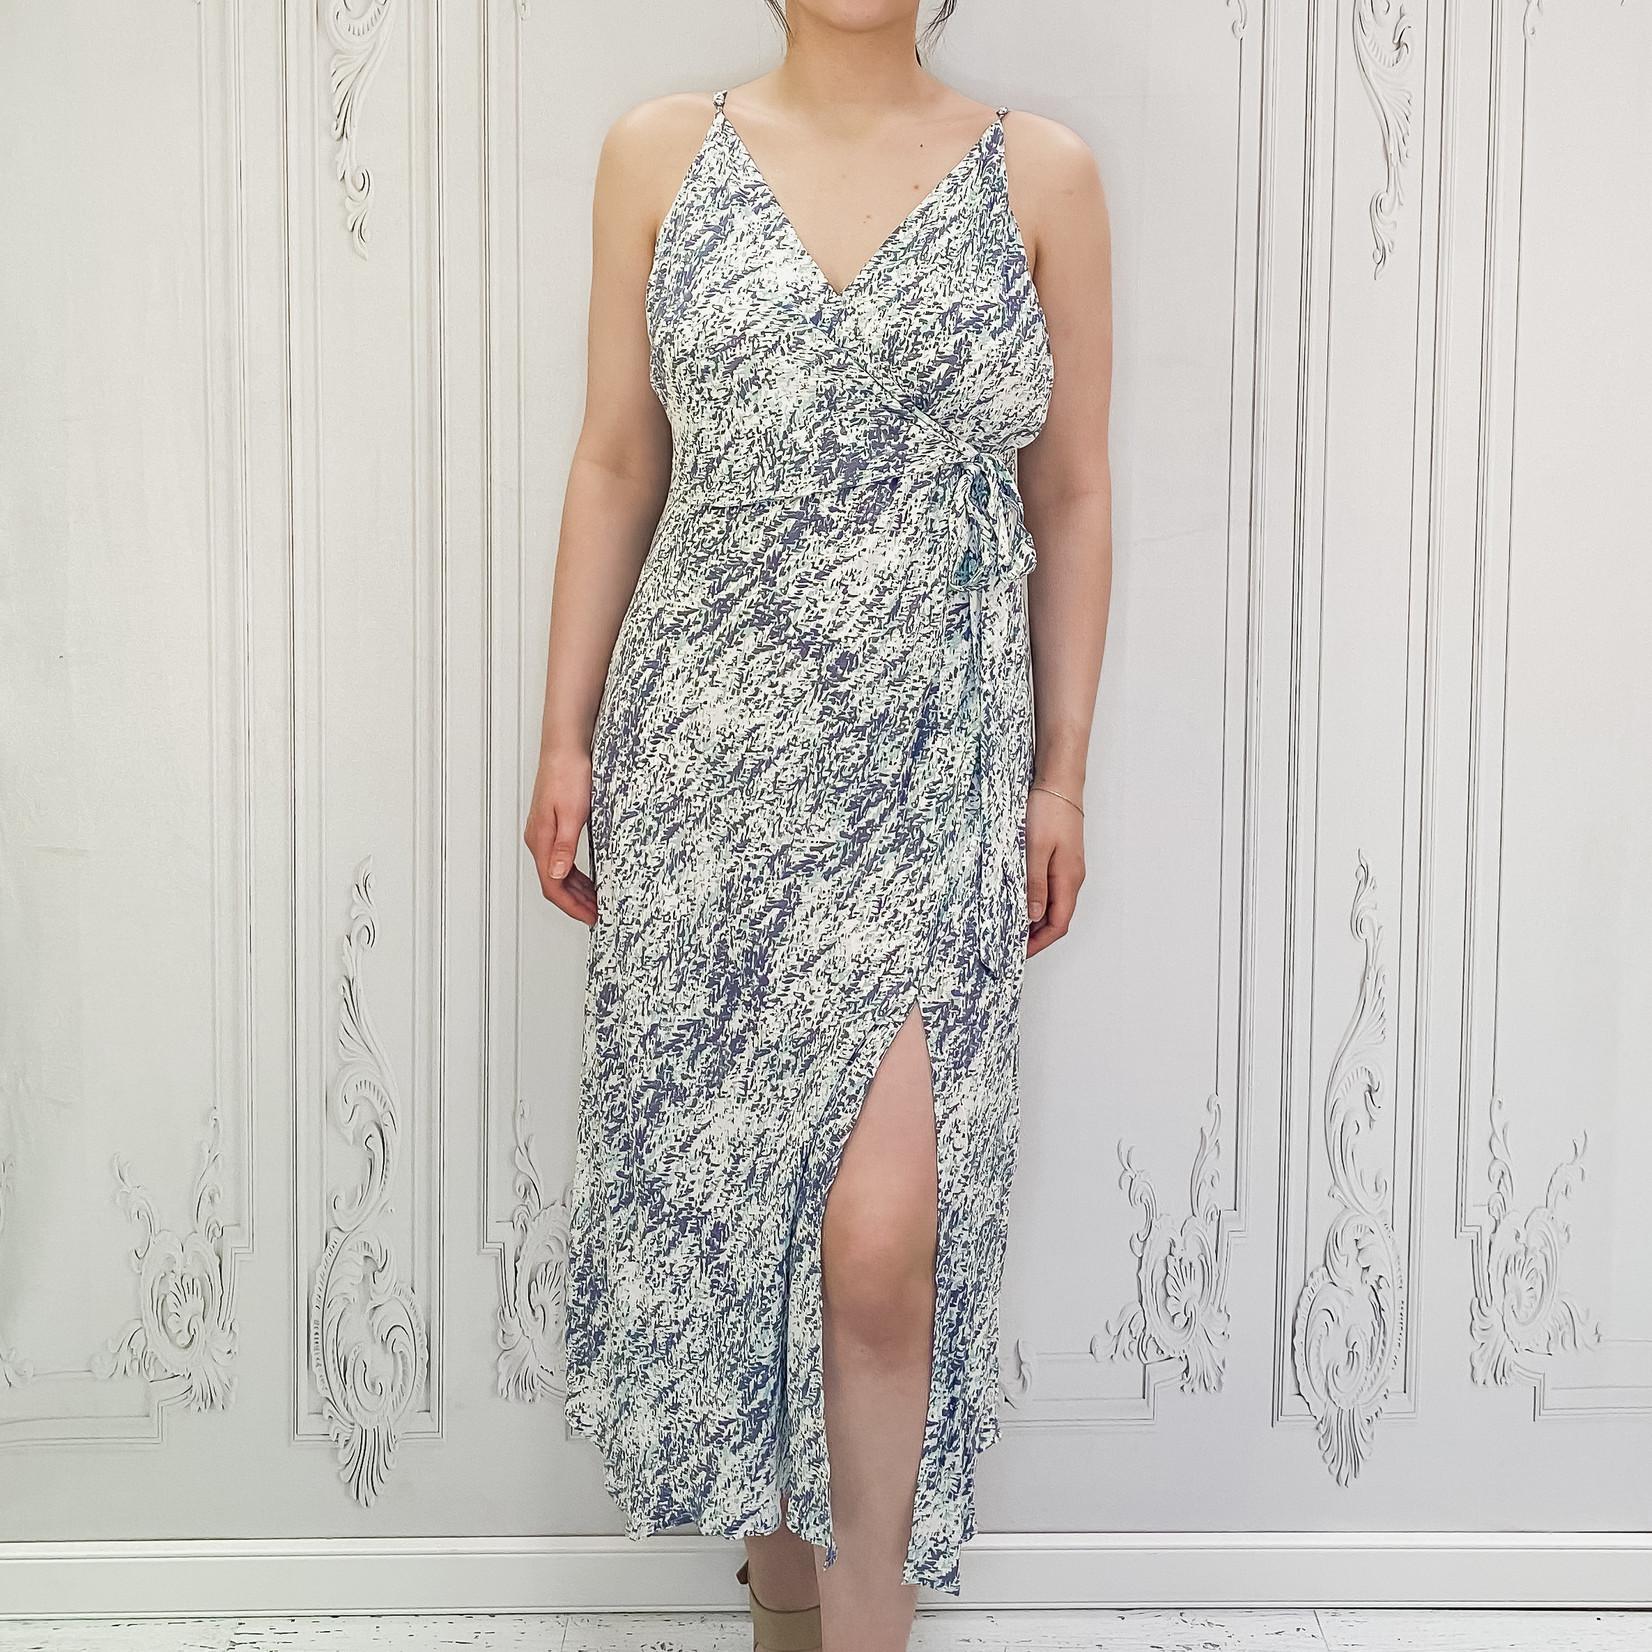 cancun dress